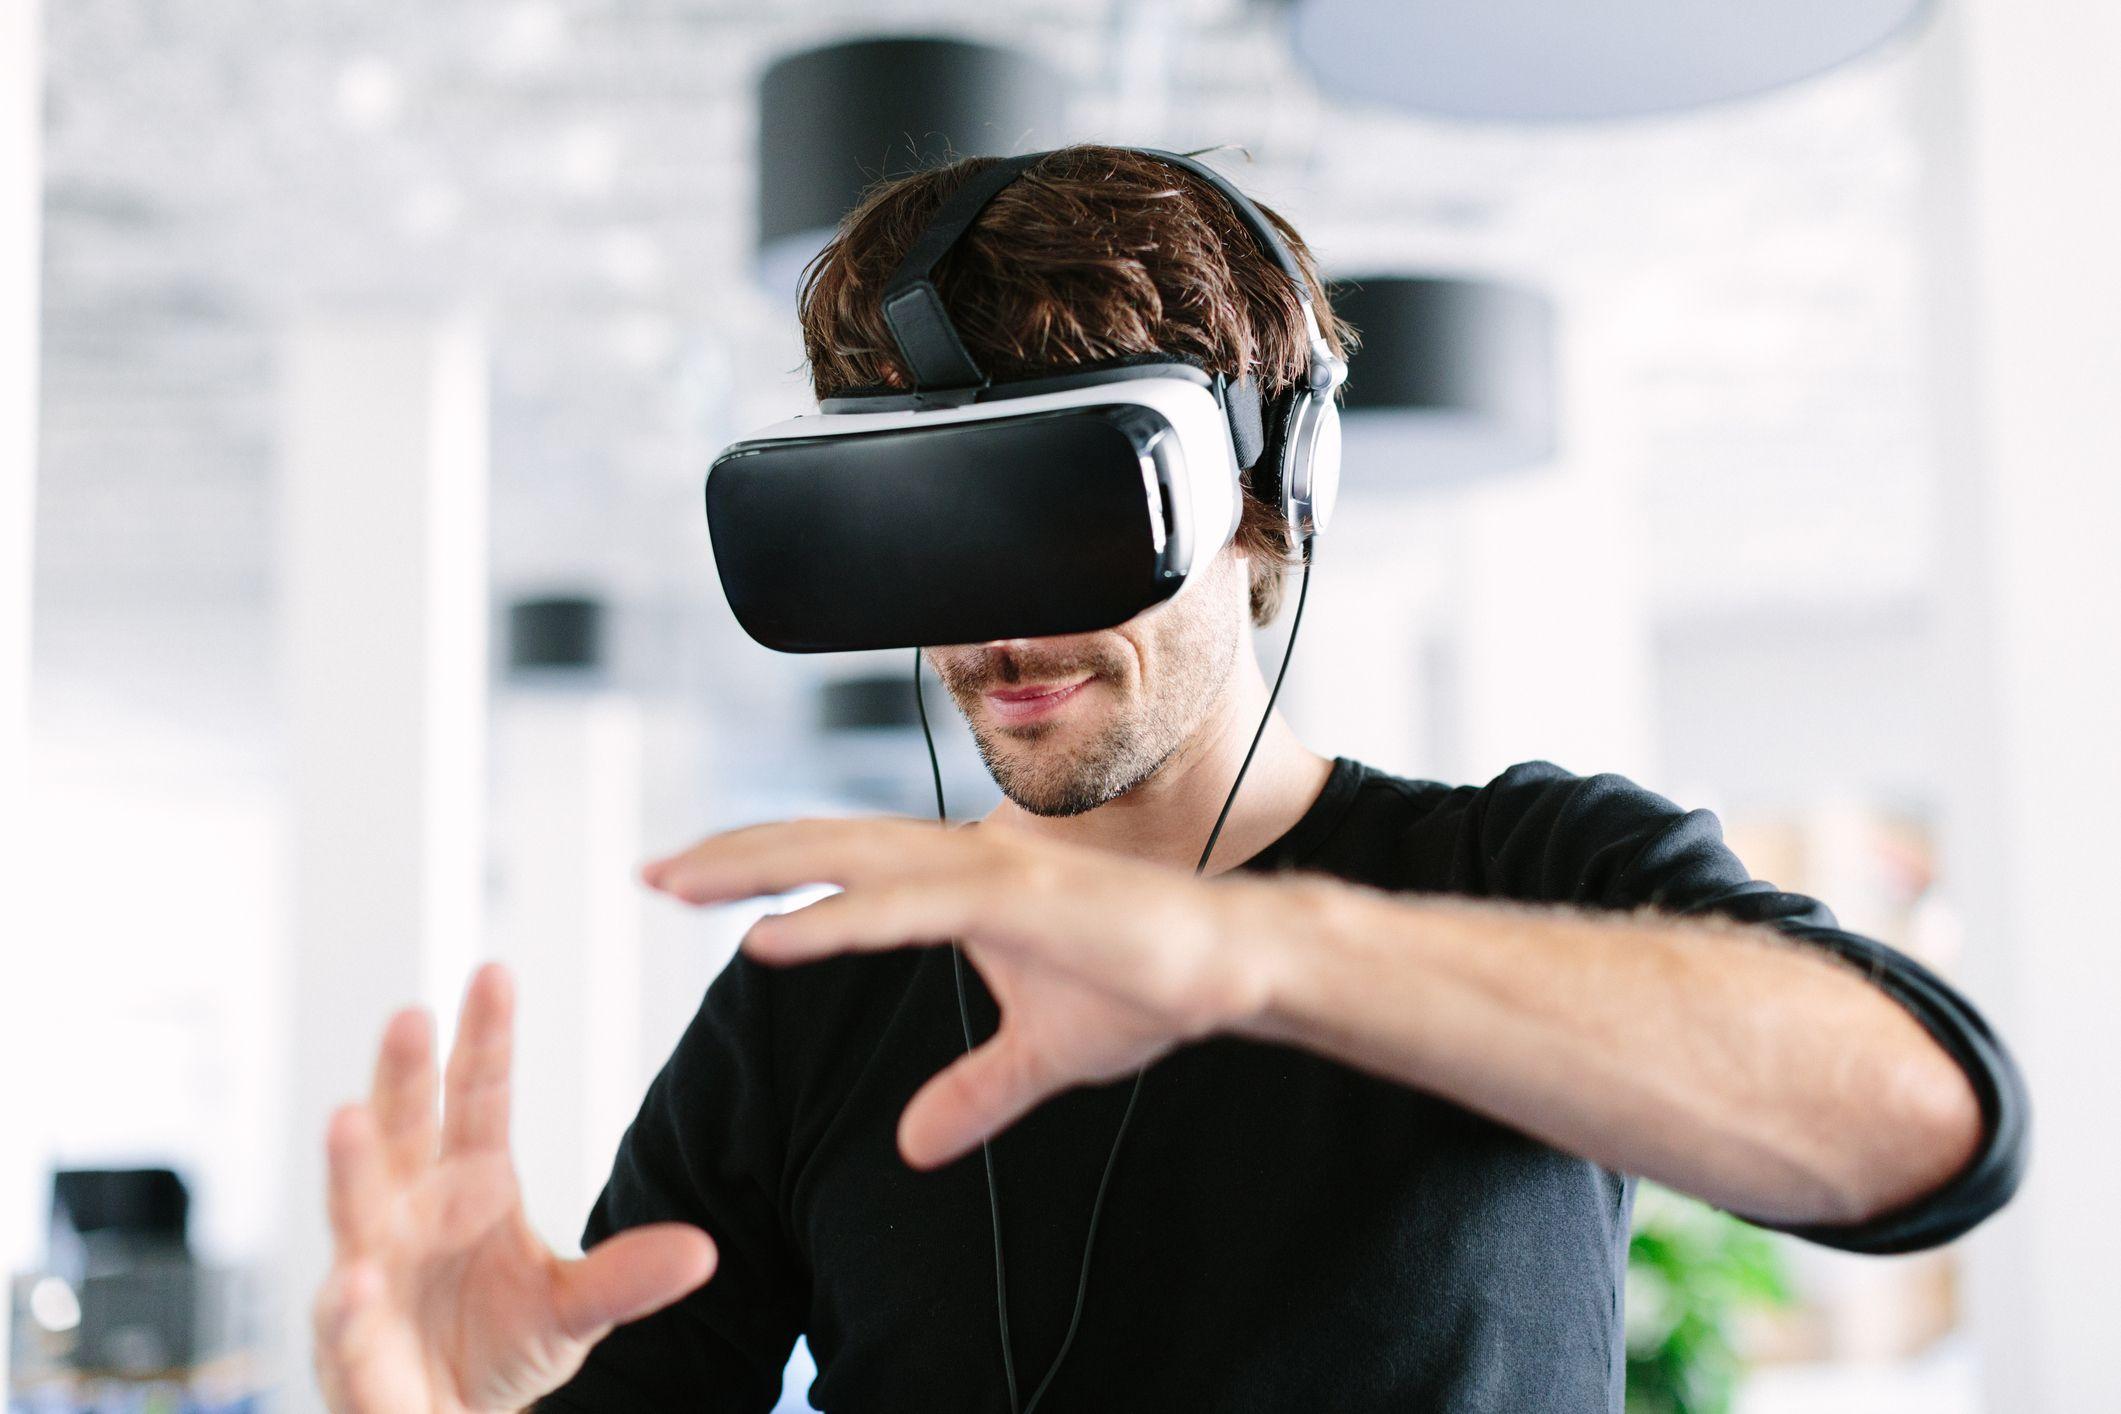 Man using a VR headset.